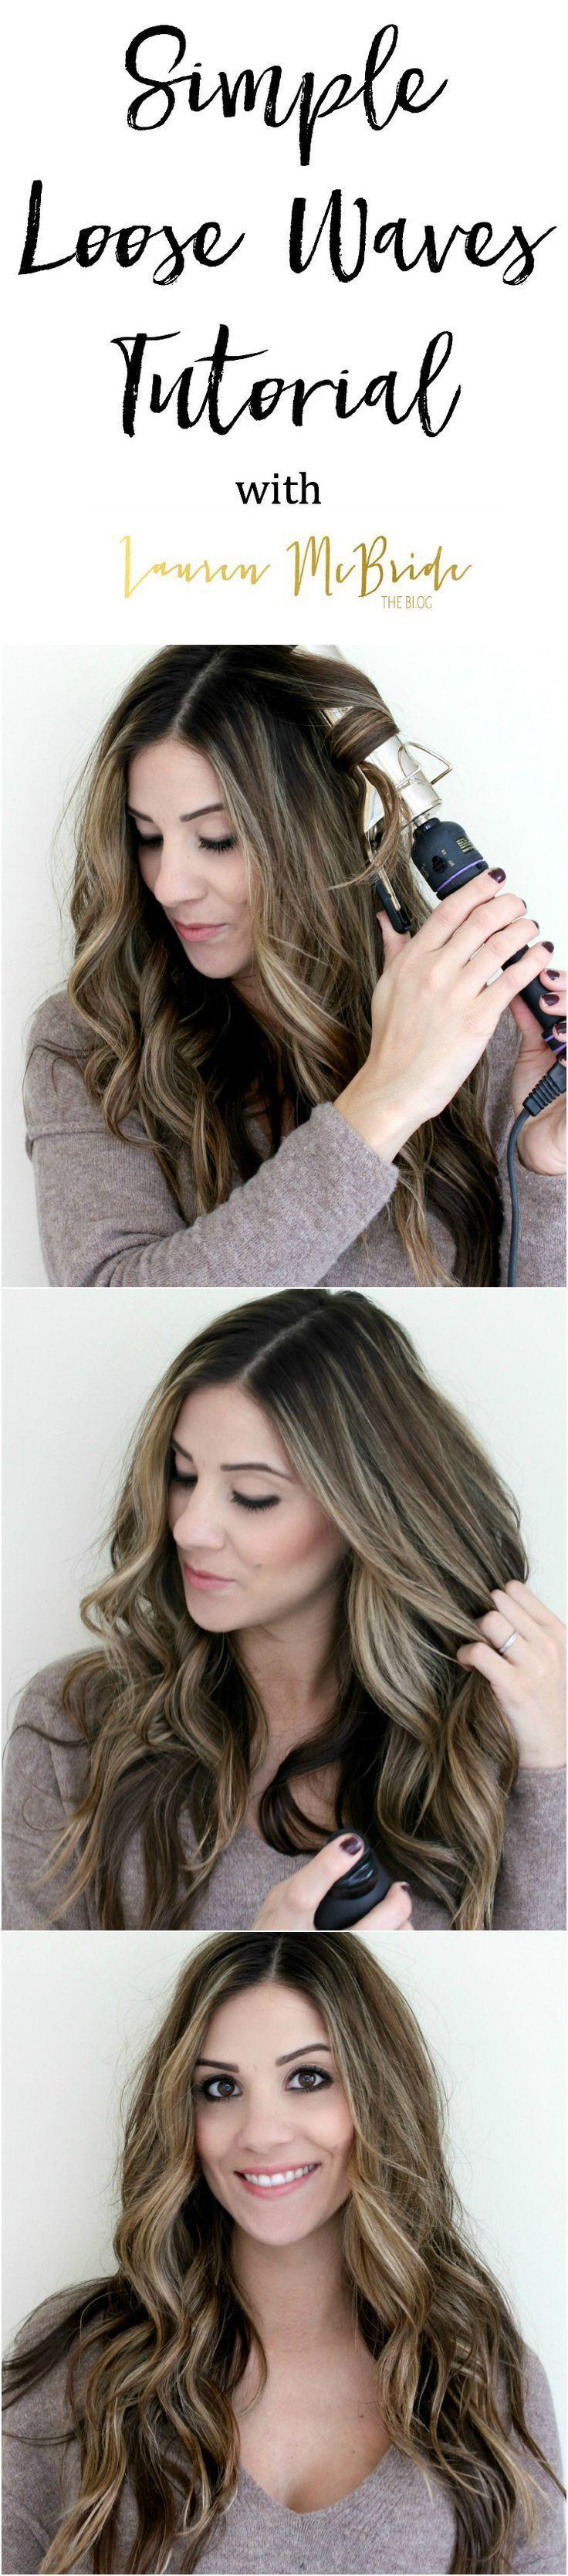 Astounding 25 Best Ideas About Loose Waves Tutorial On Pinterest Soft Short Hairstyles For Black Women Fulllsitofus